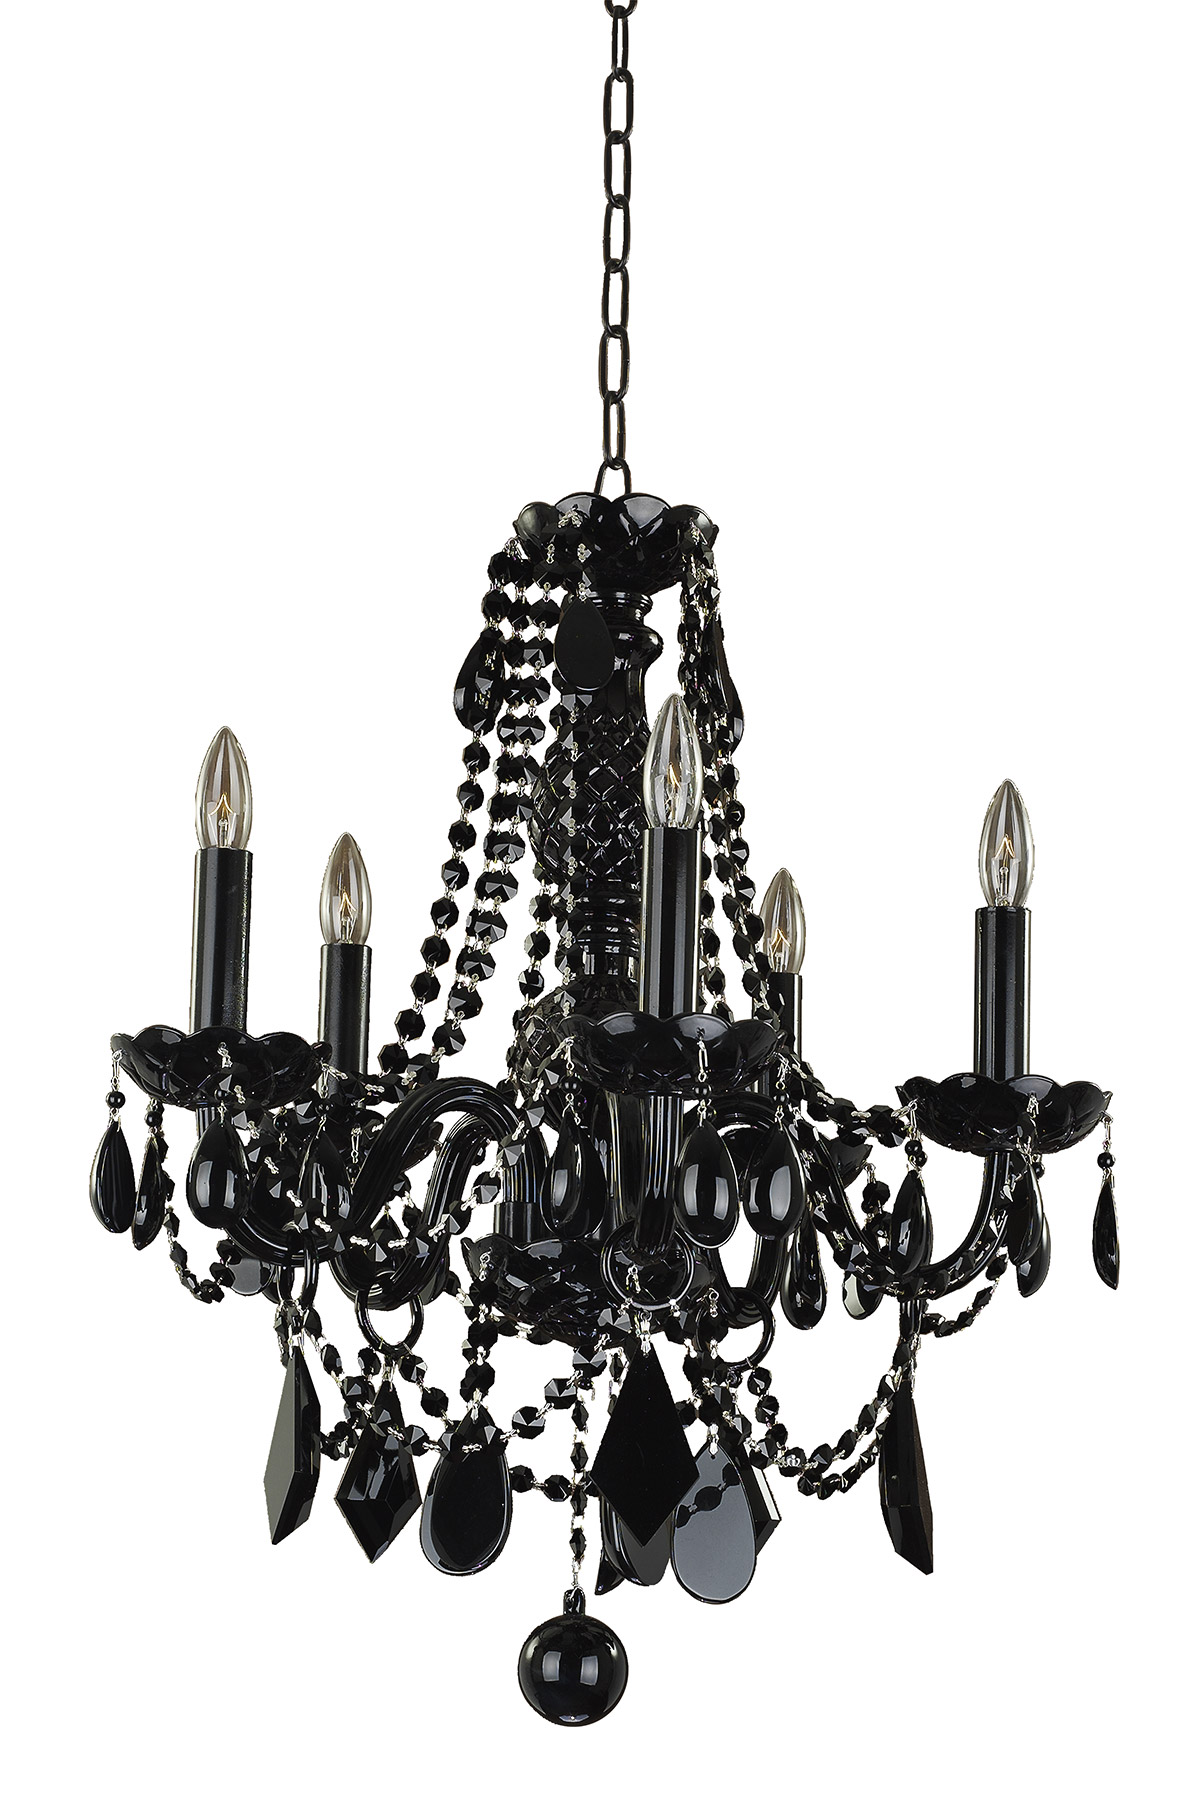 black chandelier lighting. Black Chandelier Lighting C